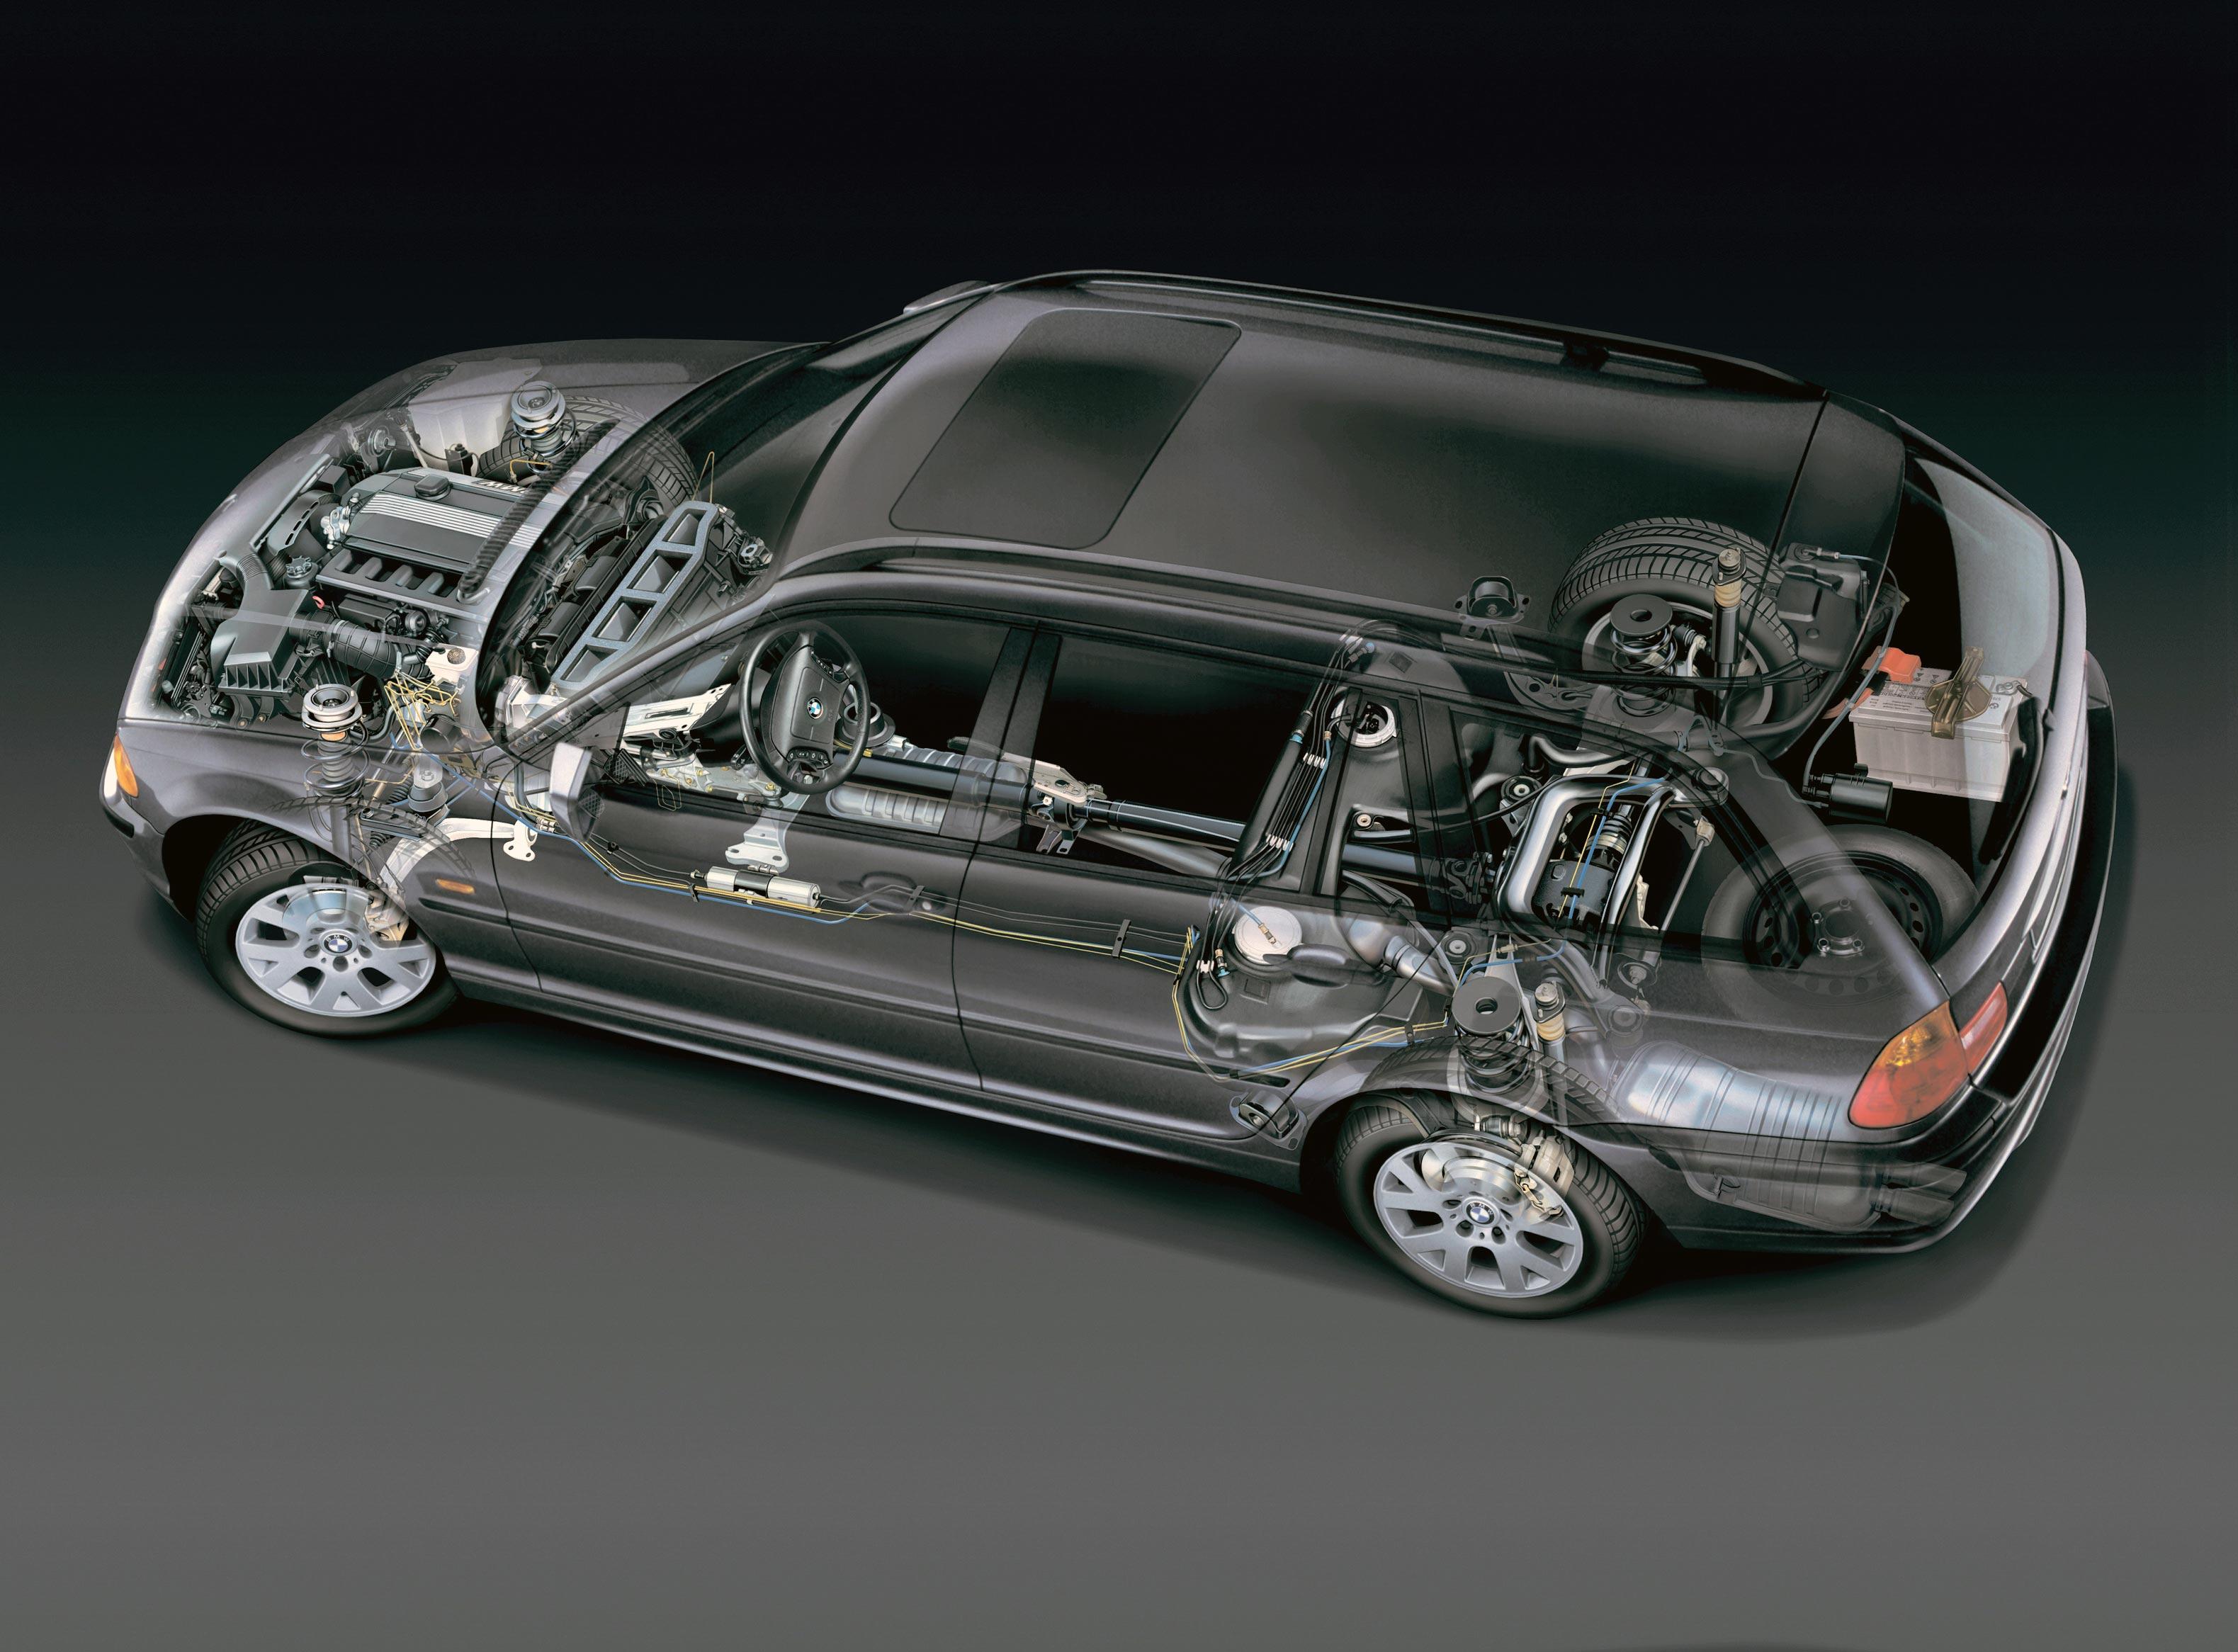 BMW 3 Series Touring E46 cutaway drawing